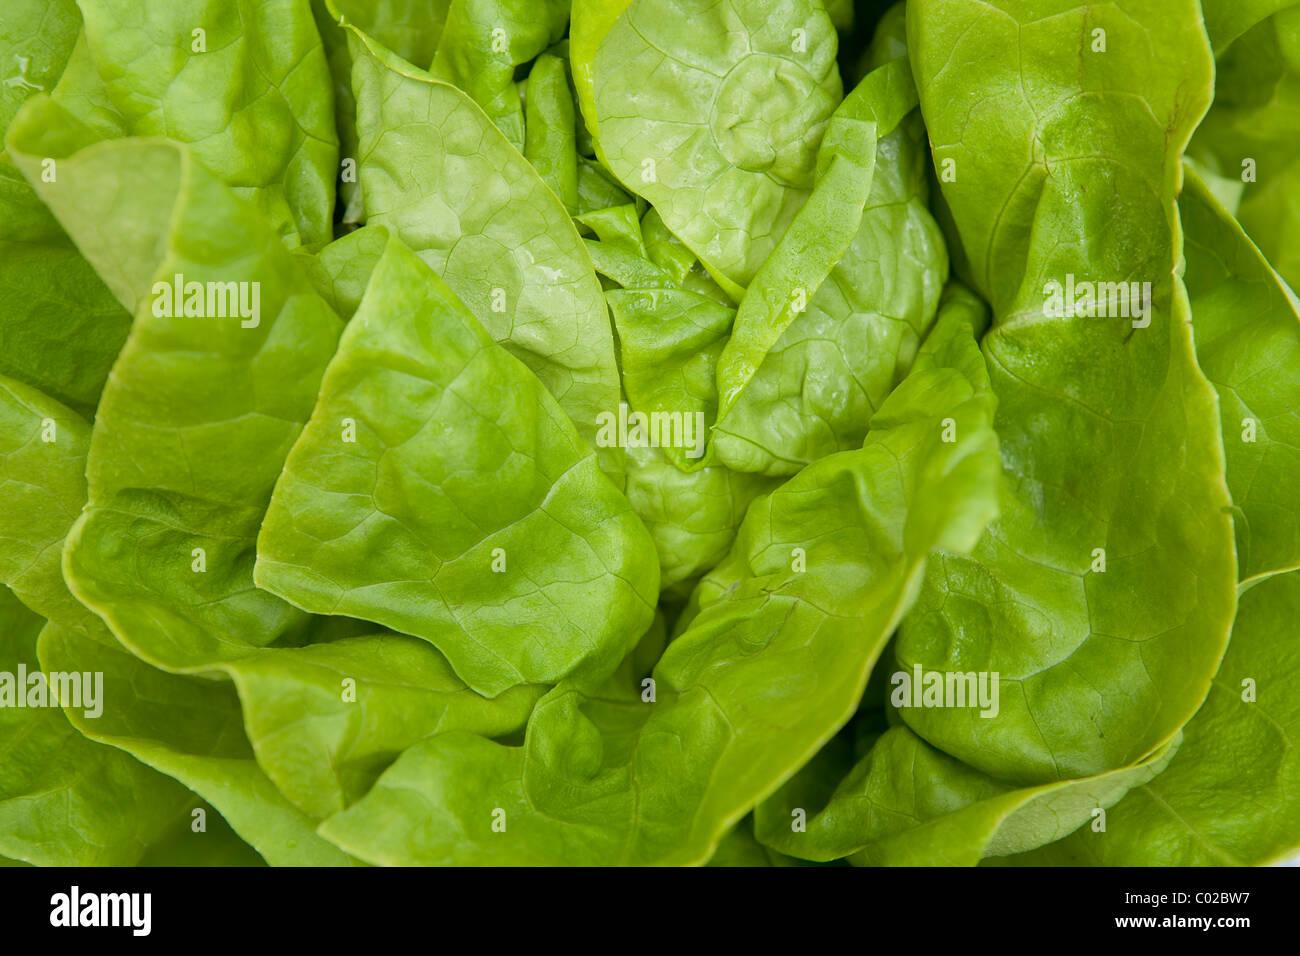 Salat, Nahaufnahme, Vollbild Stockbild